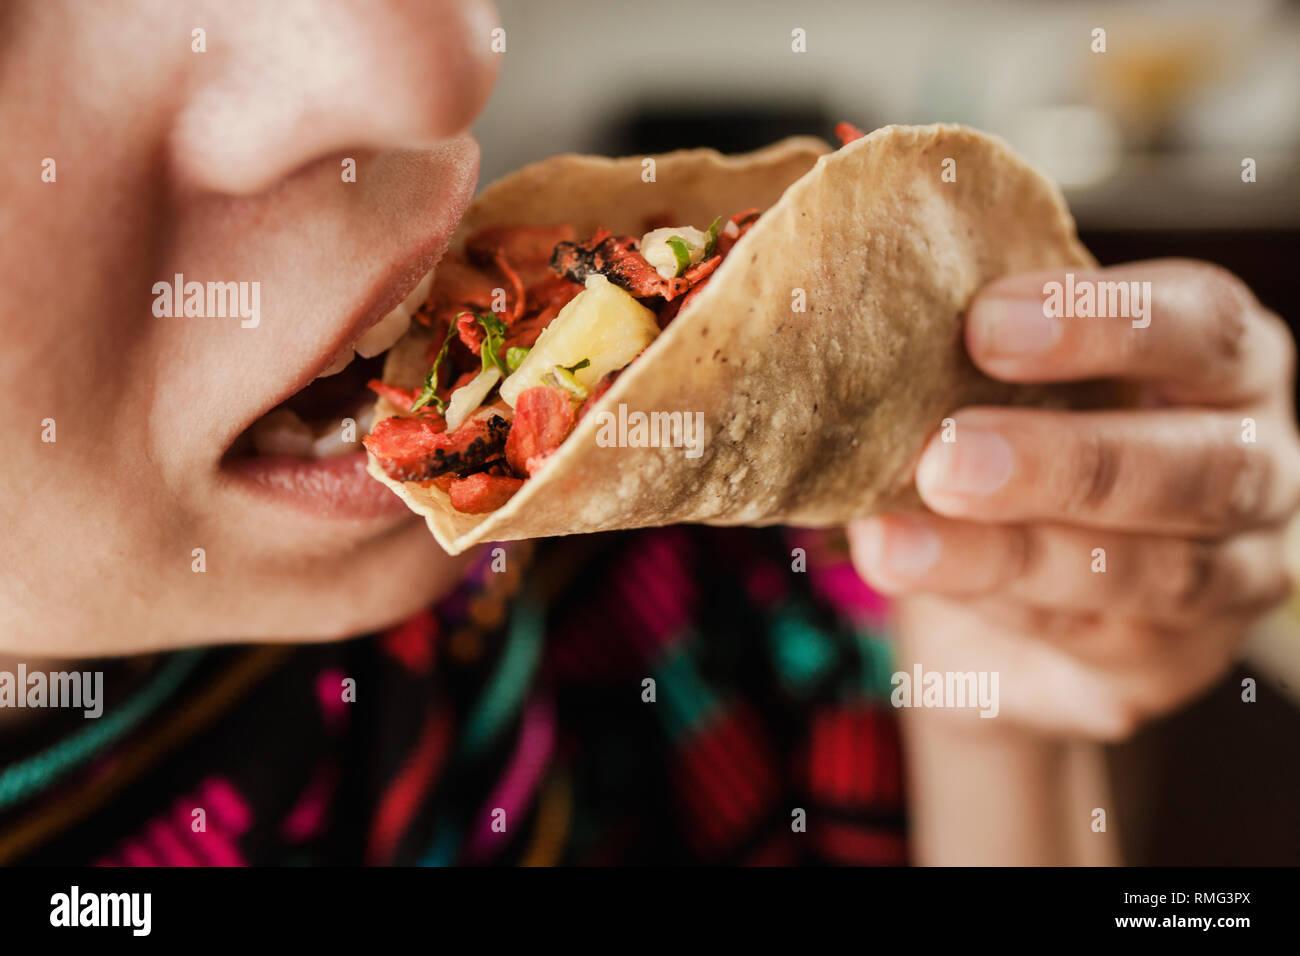 Erntegut Frau mit Taco al Pastor Stockbild